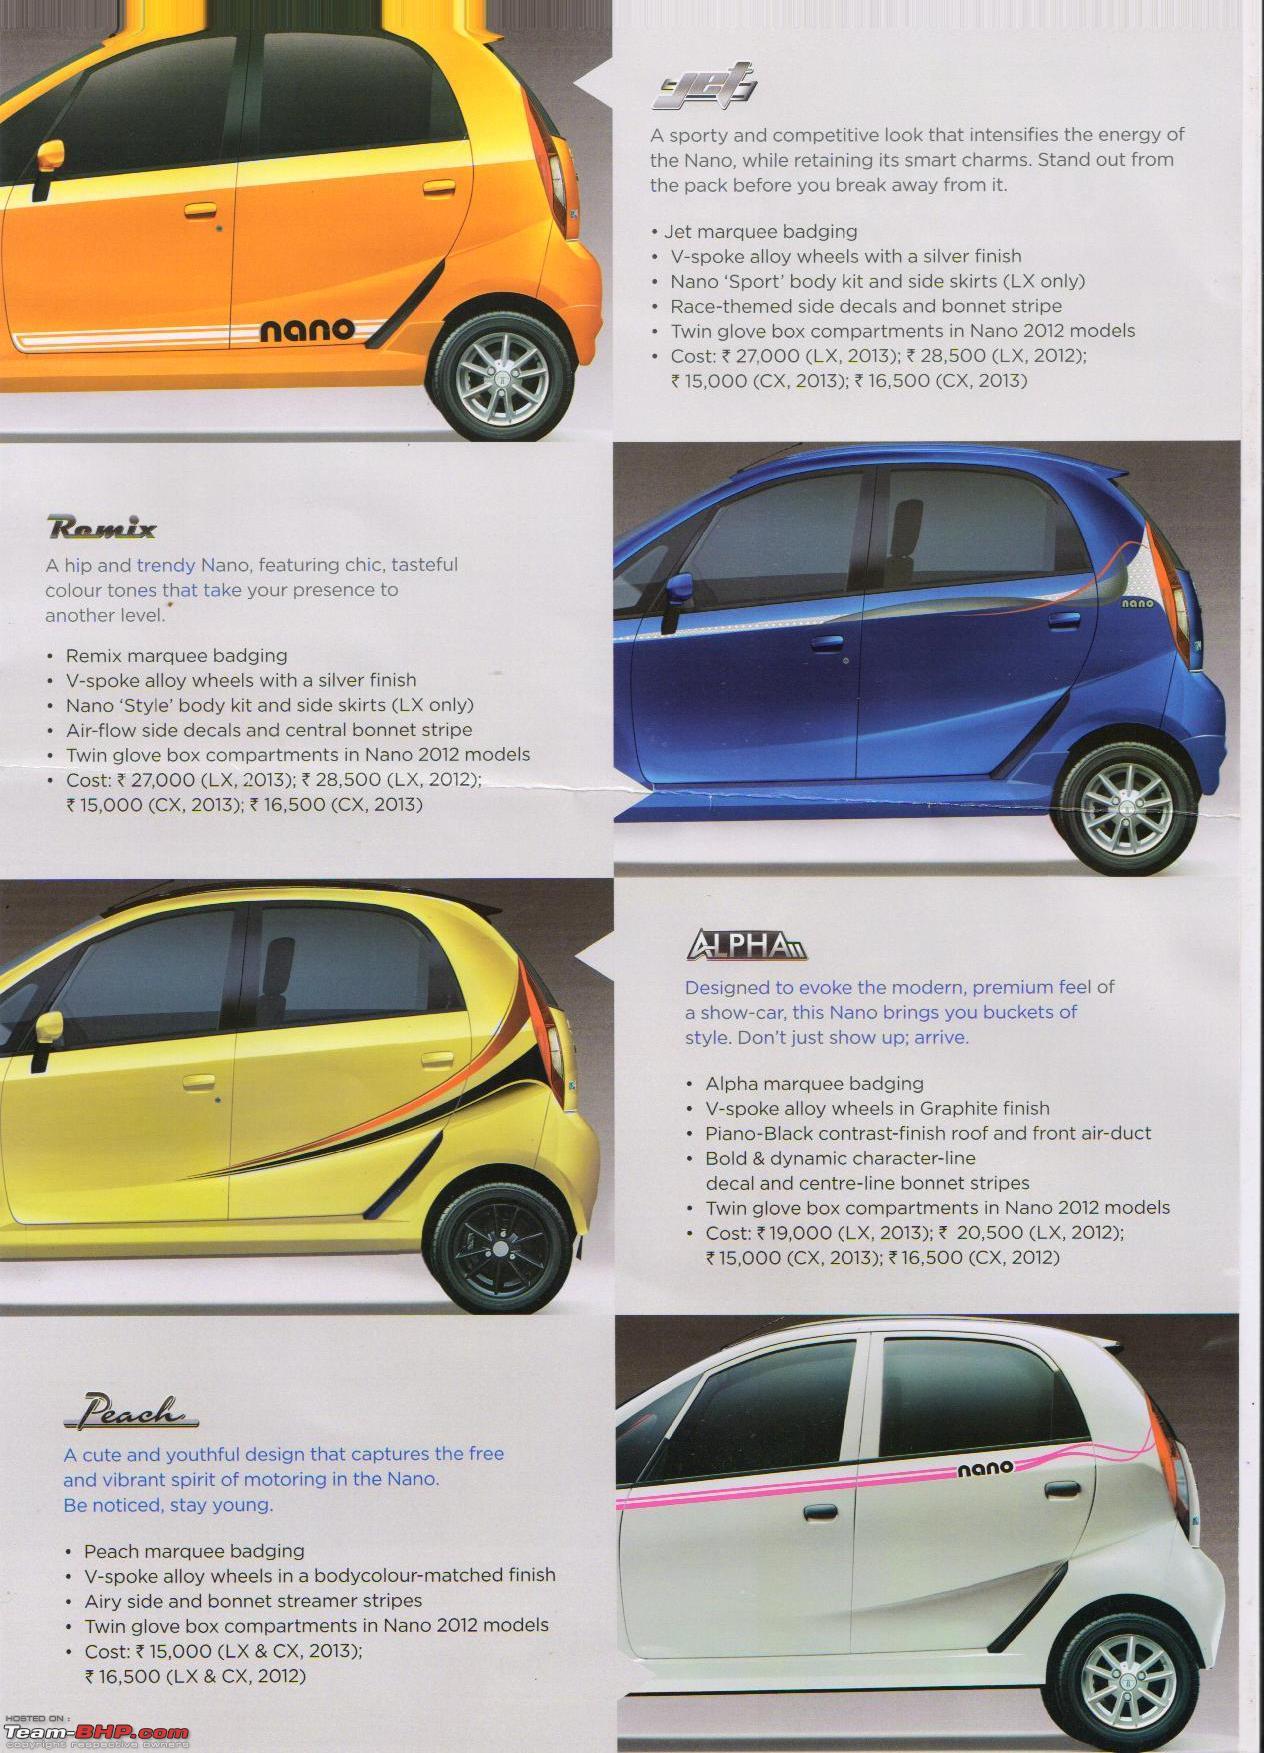 Design of tata nano car - The 2013 Tata Nano Lots Of Updates 2013tatananobodykitprices Jpg